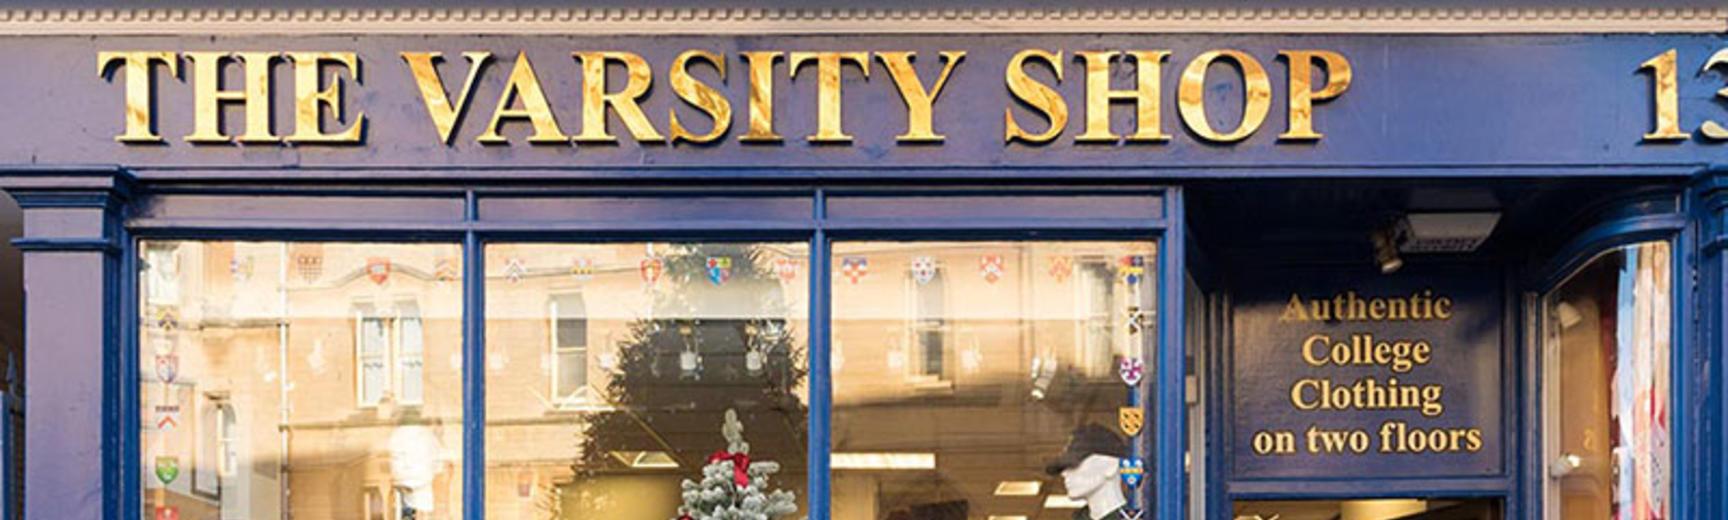 A white Oxford University hoodie